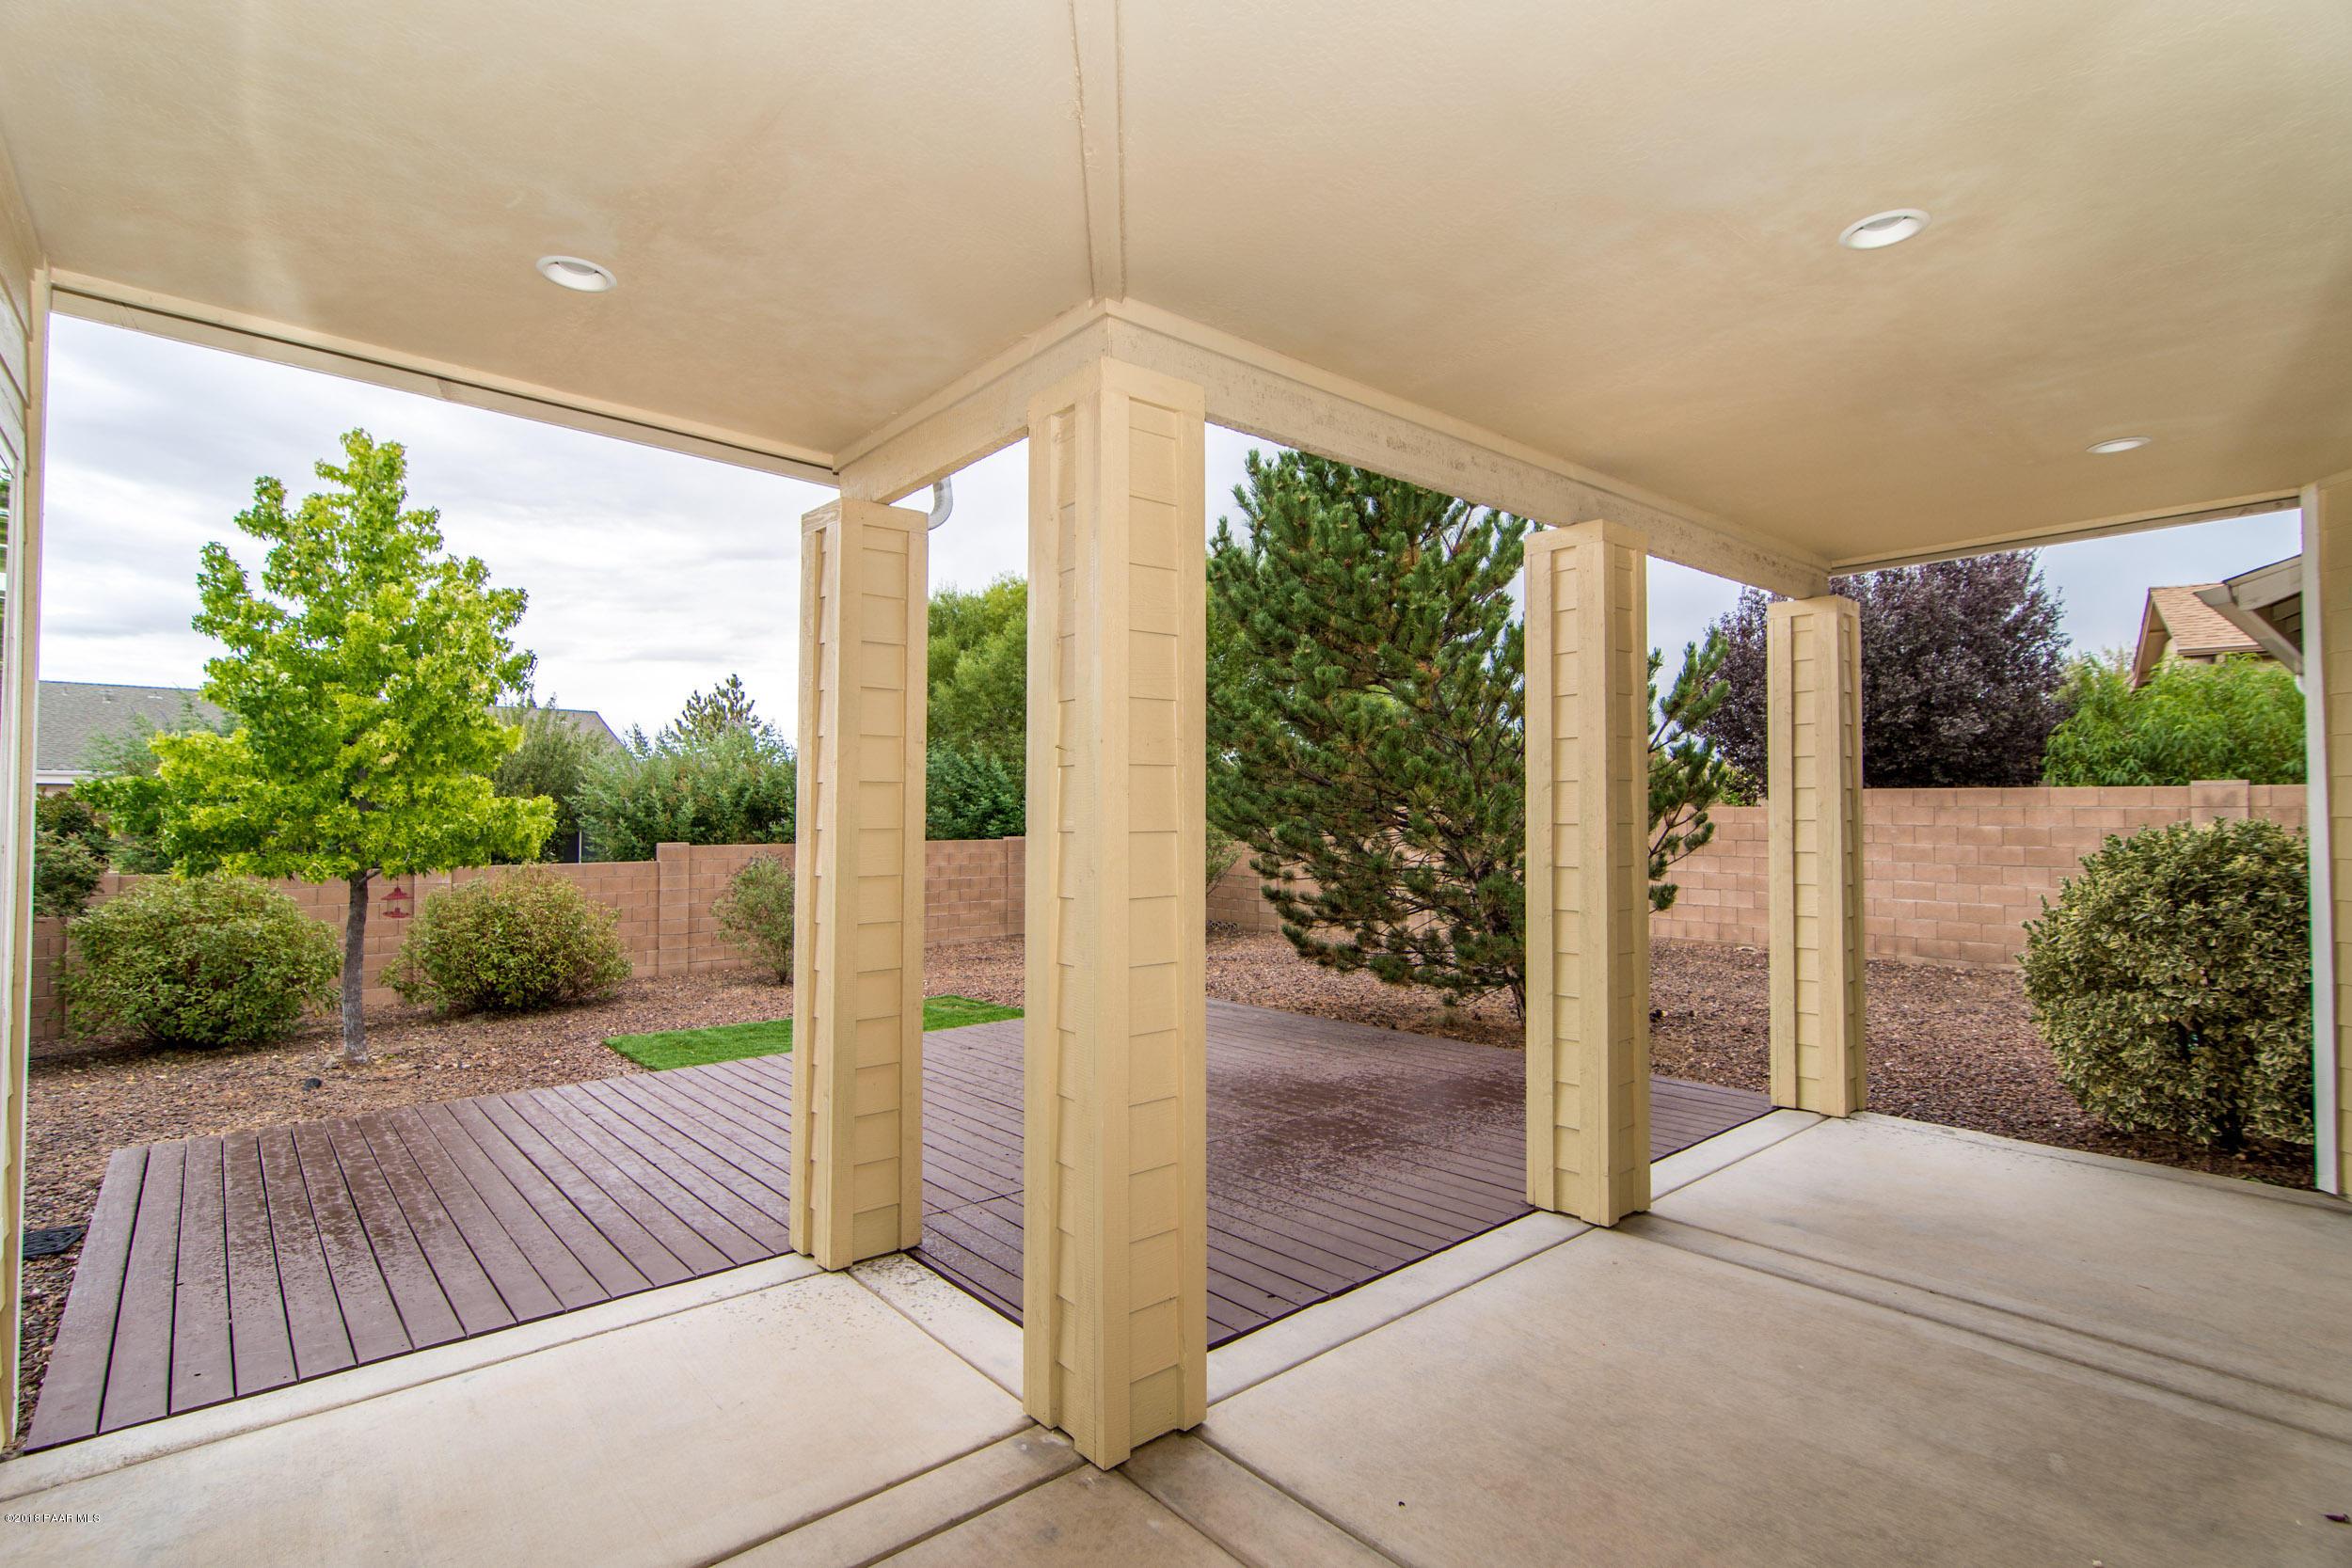 7848 Prickly Pear Prescott Valley, AZ 86315 - MLS #: 1015615